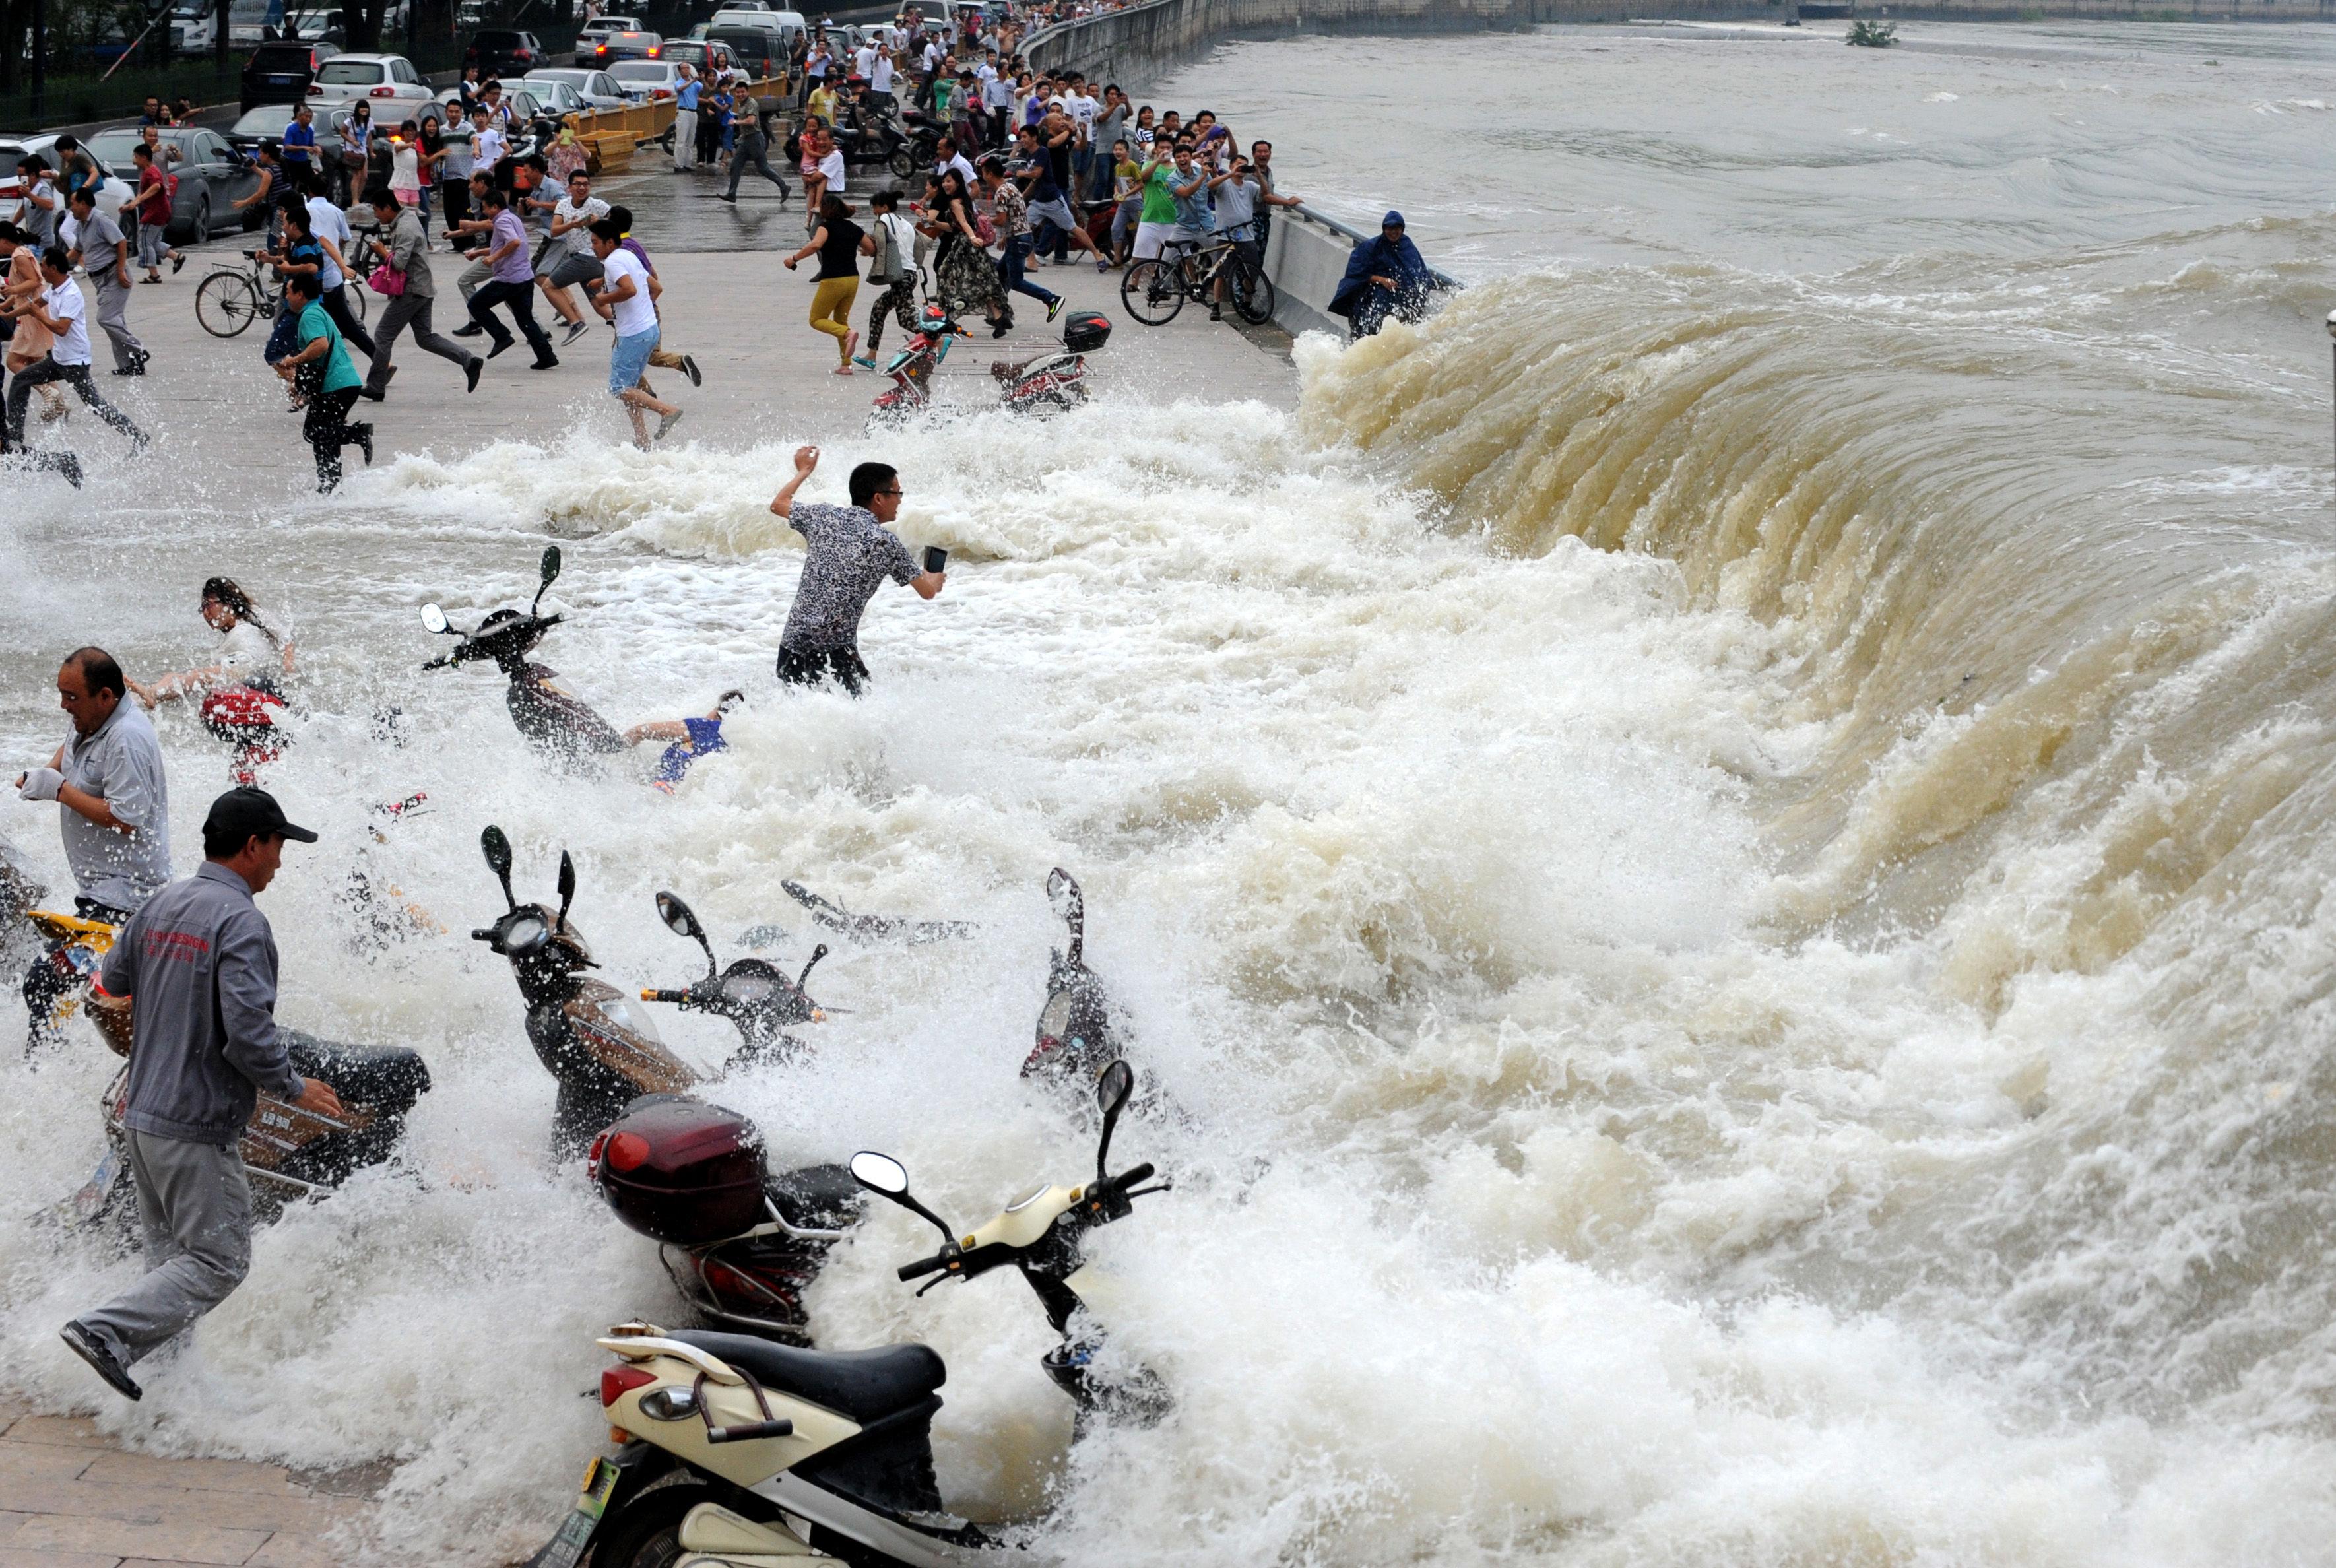 río chino ola